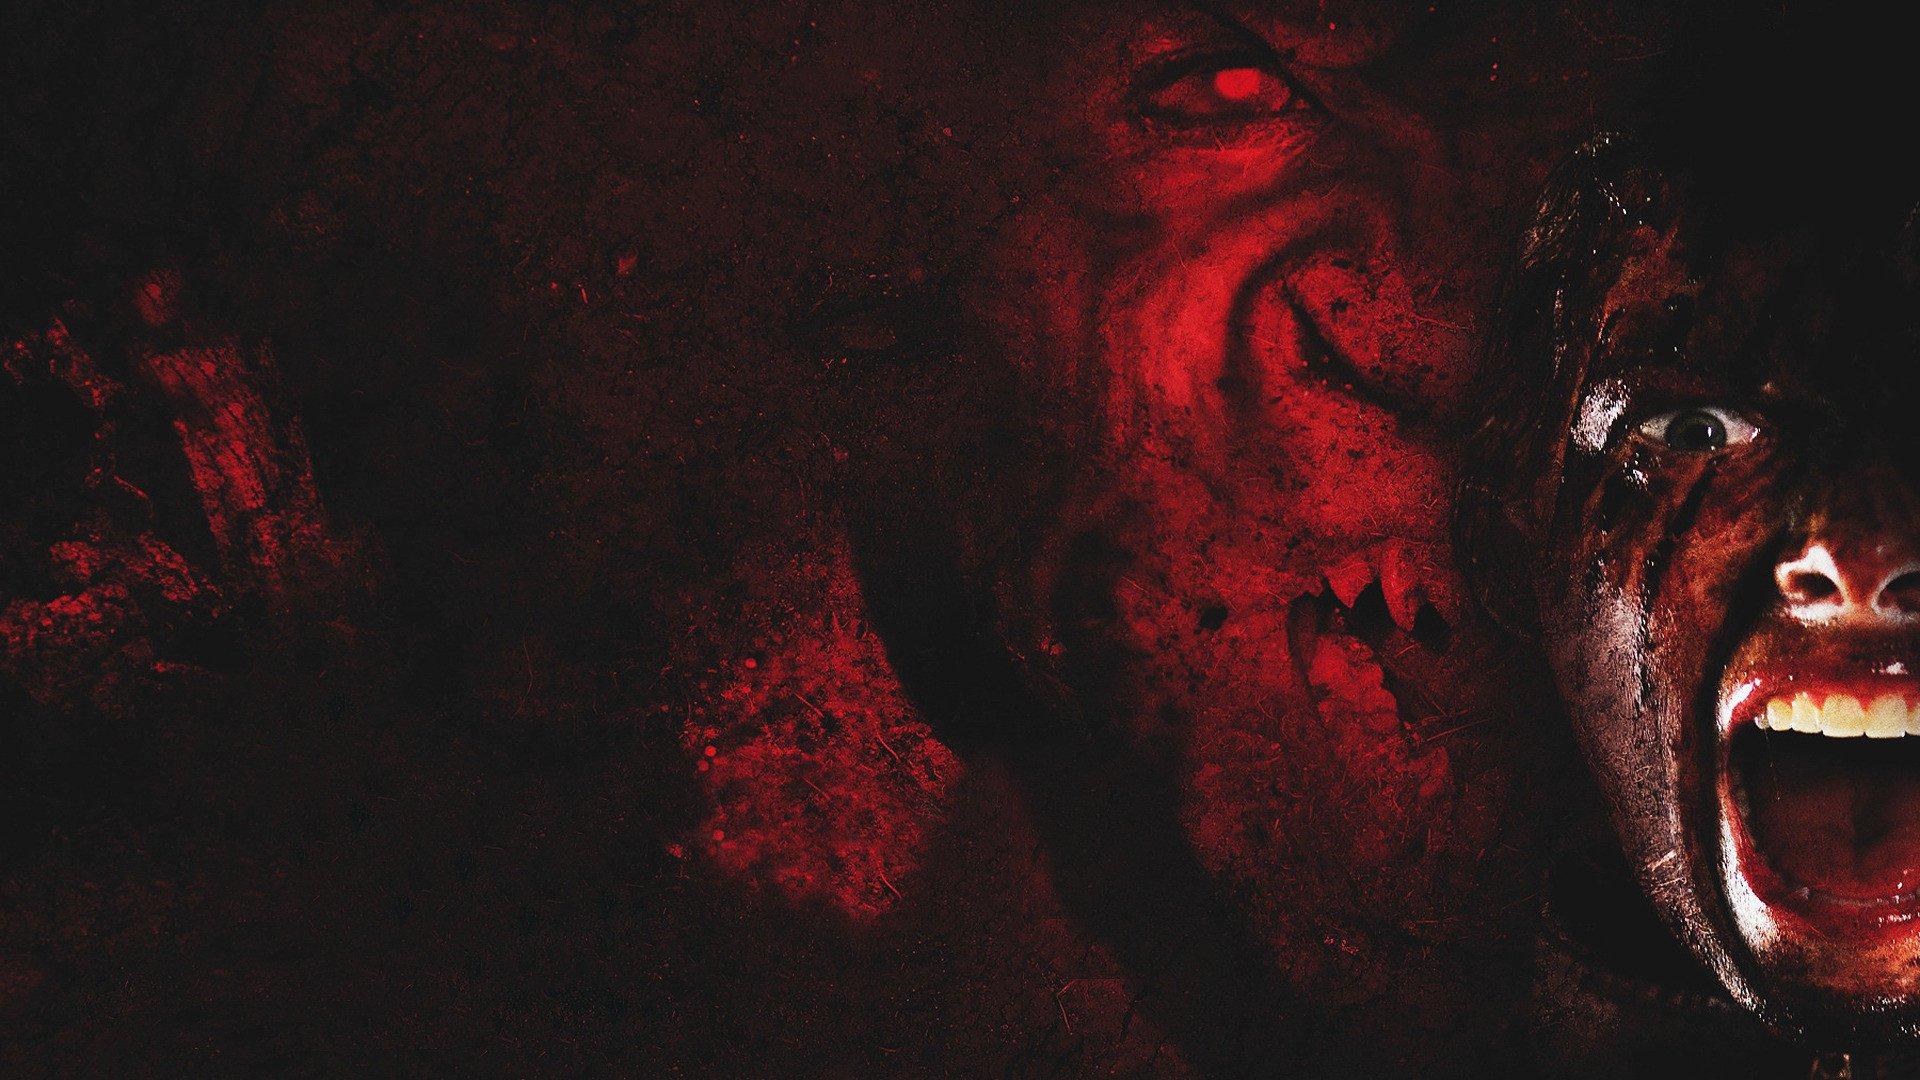 Regarder The Descent : Part 2 en streaming gratuit